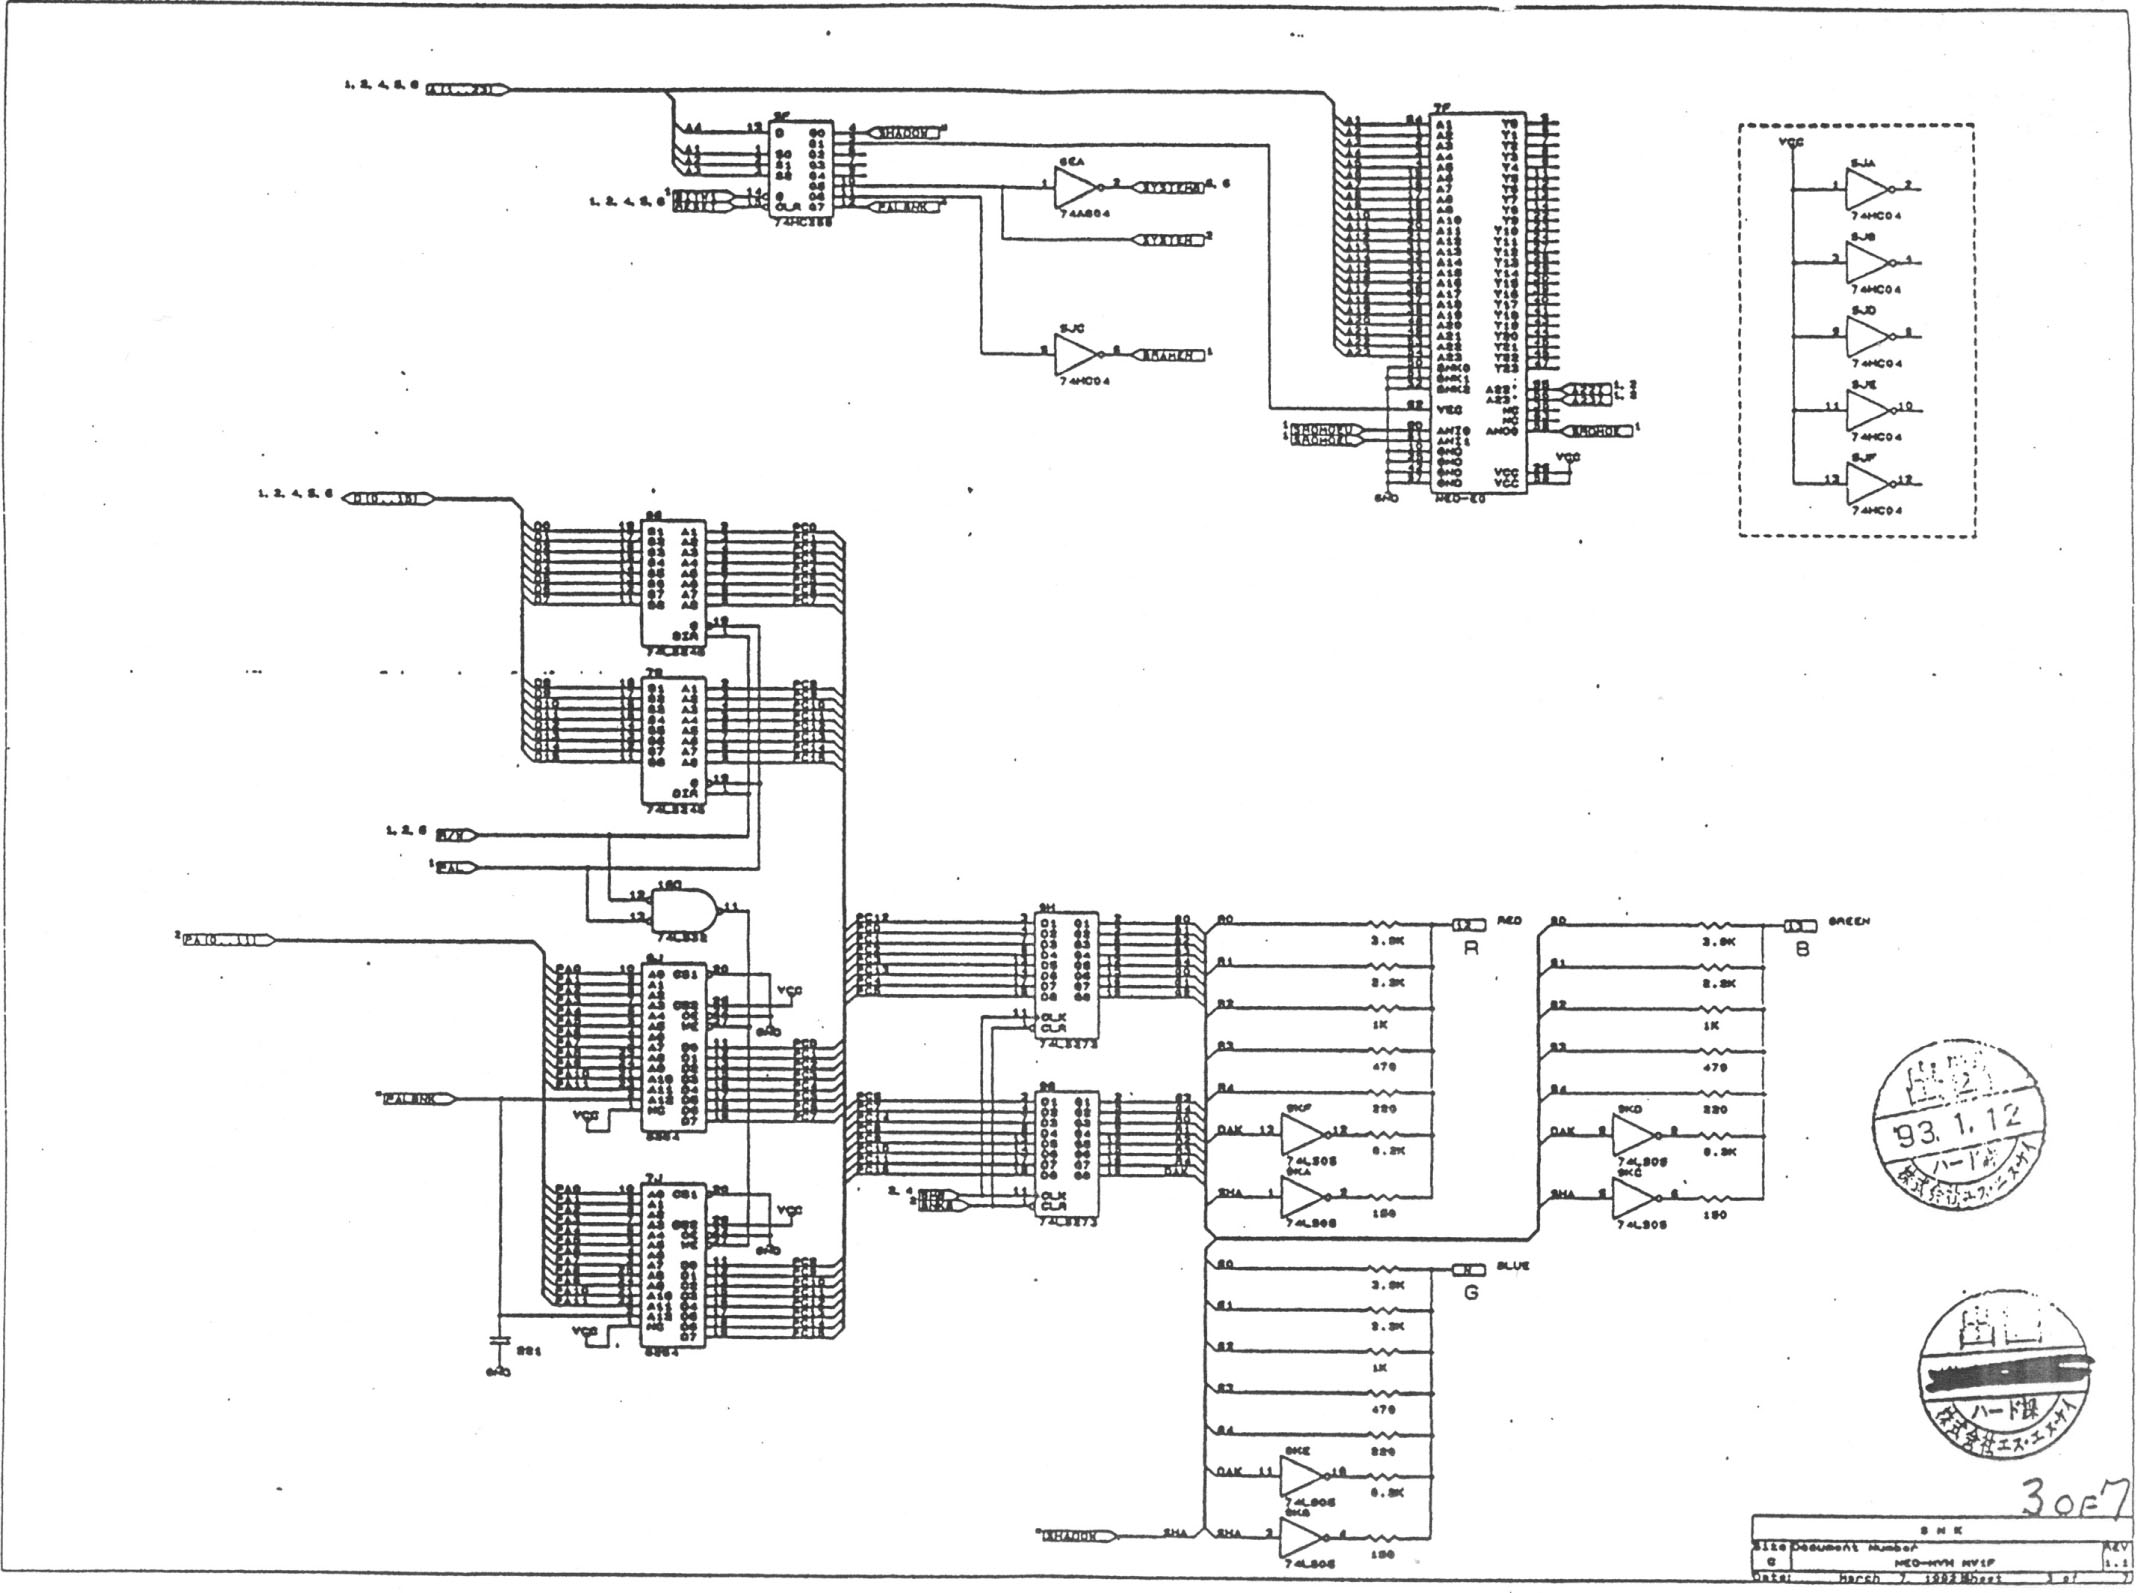 Mvs wire diagram trusted wiring diagram neo geo mvs schematics diy enthusiasts wiring diagrams u2022 trailer wiring diagram mvs wire diagram asfbconference2016 Gallery